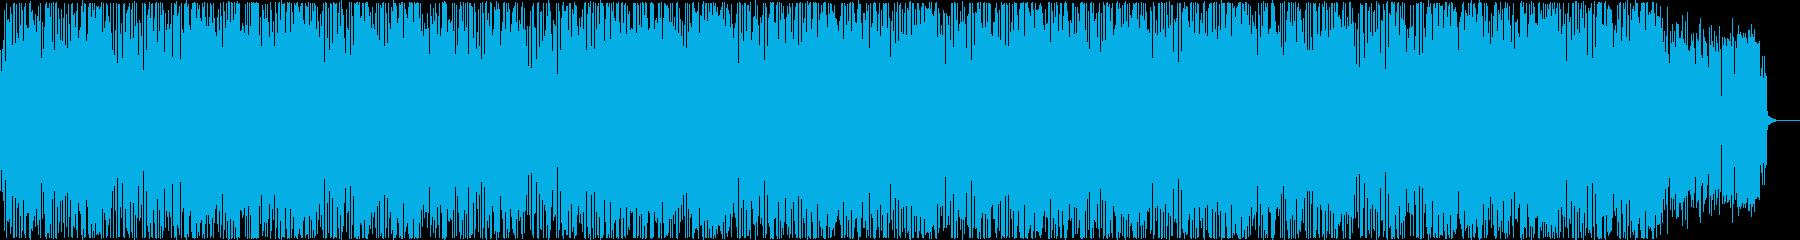 CM、企業VPFuture Bass aの再生済みの波形